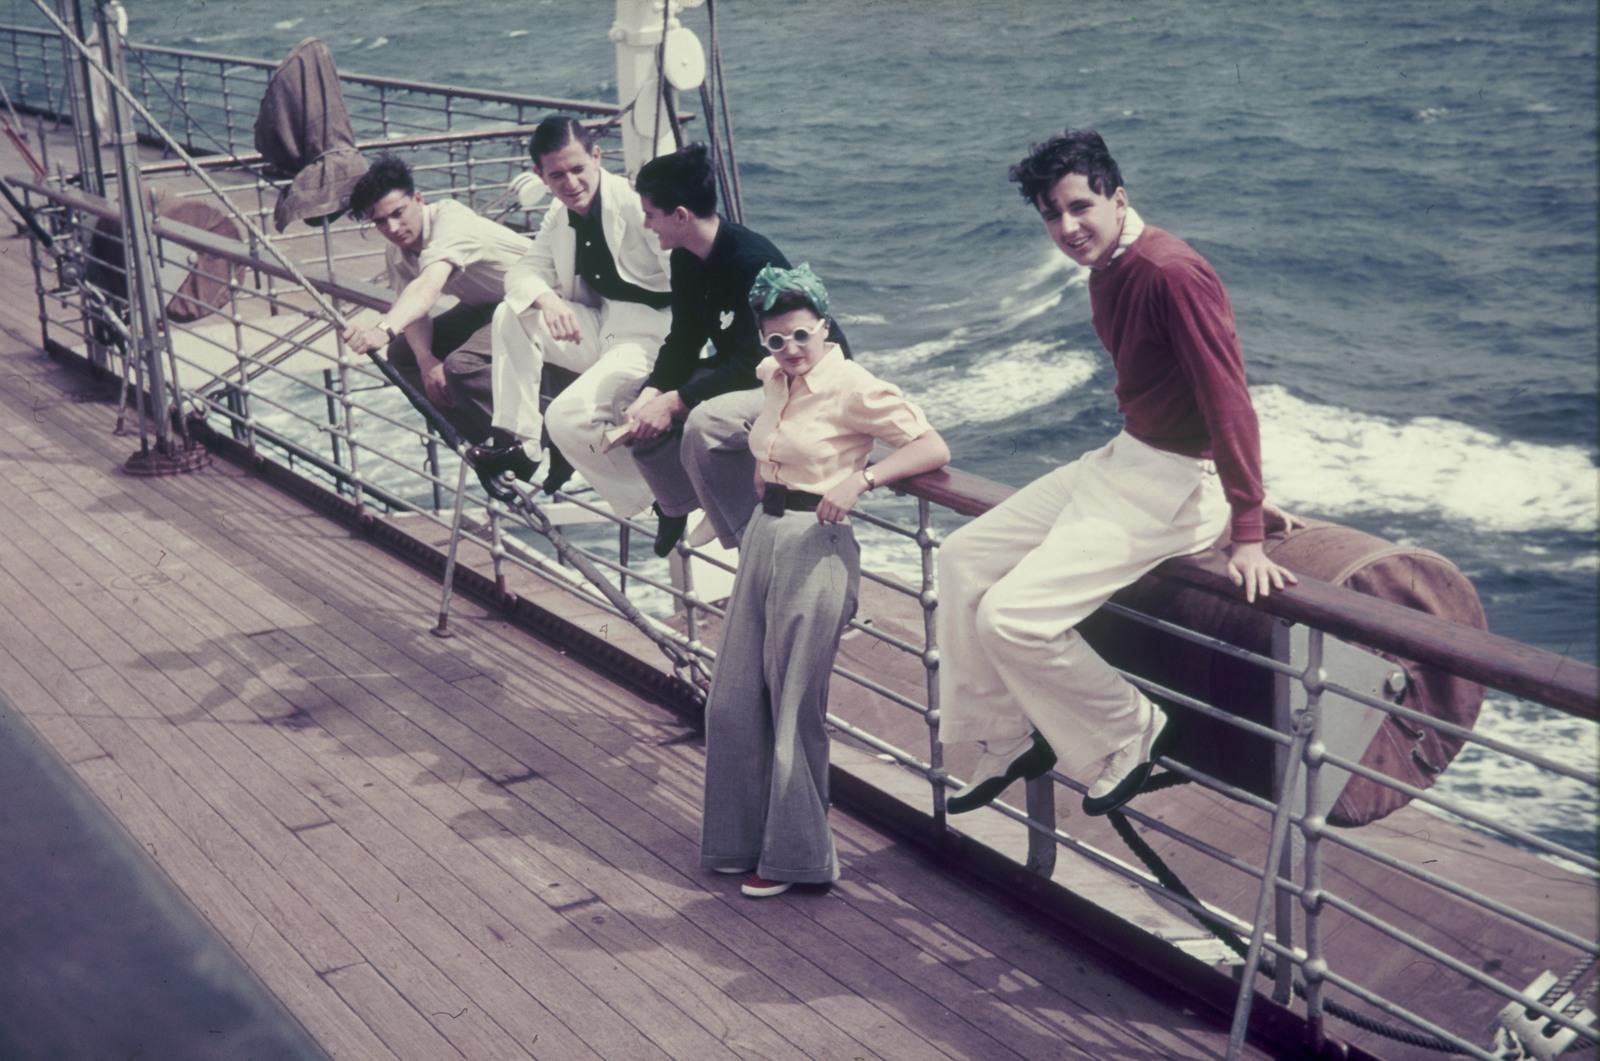 Пассажиры на перилах судна